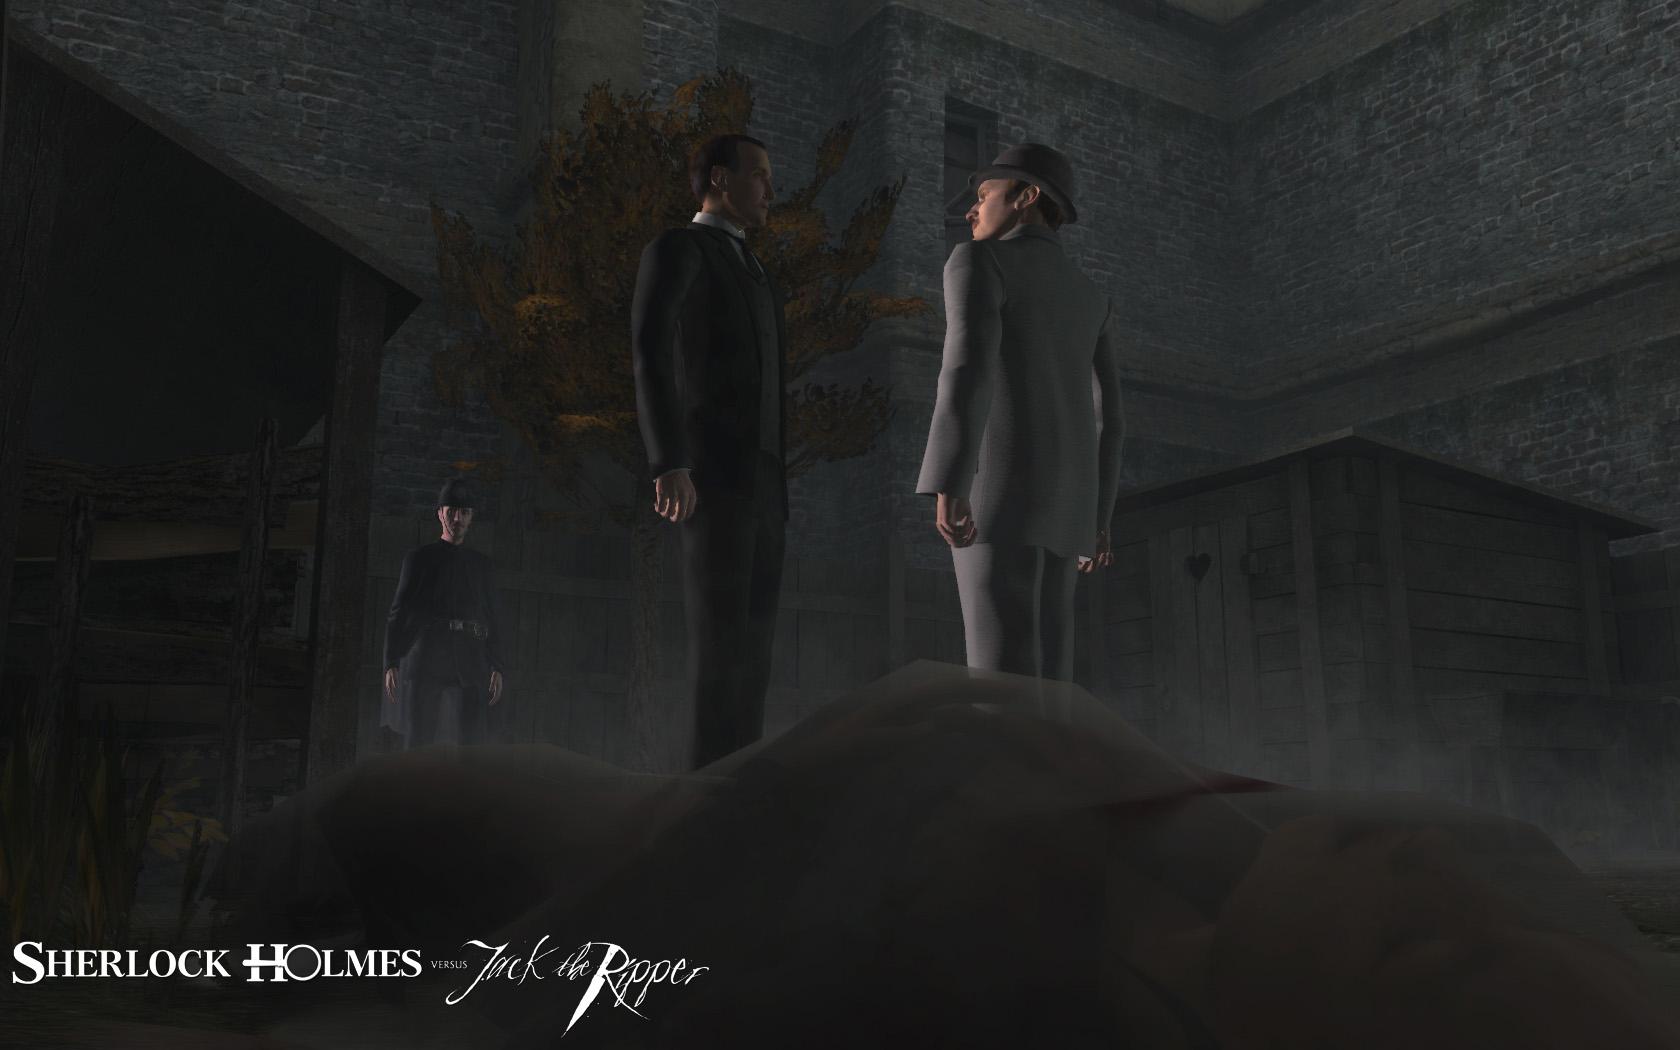 Sherlock Holmes versus Jack the Ripper screenshot